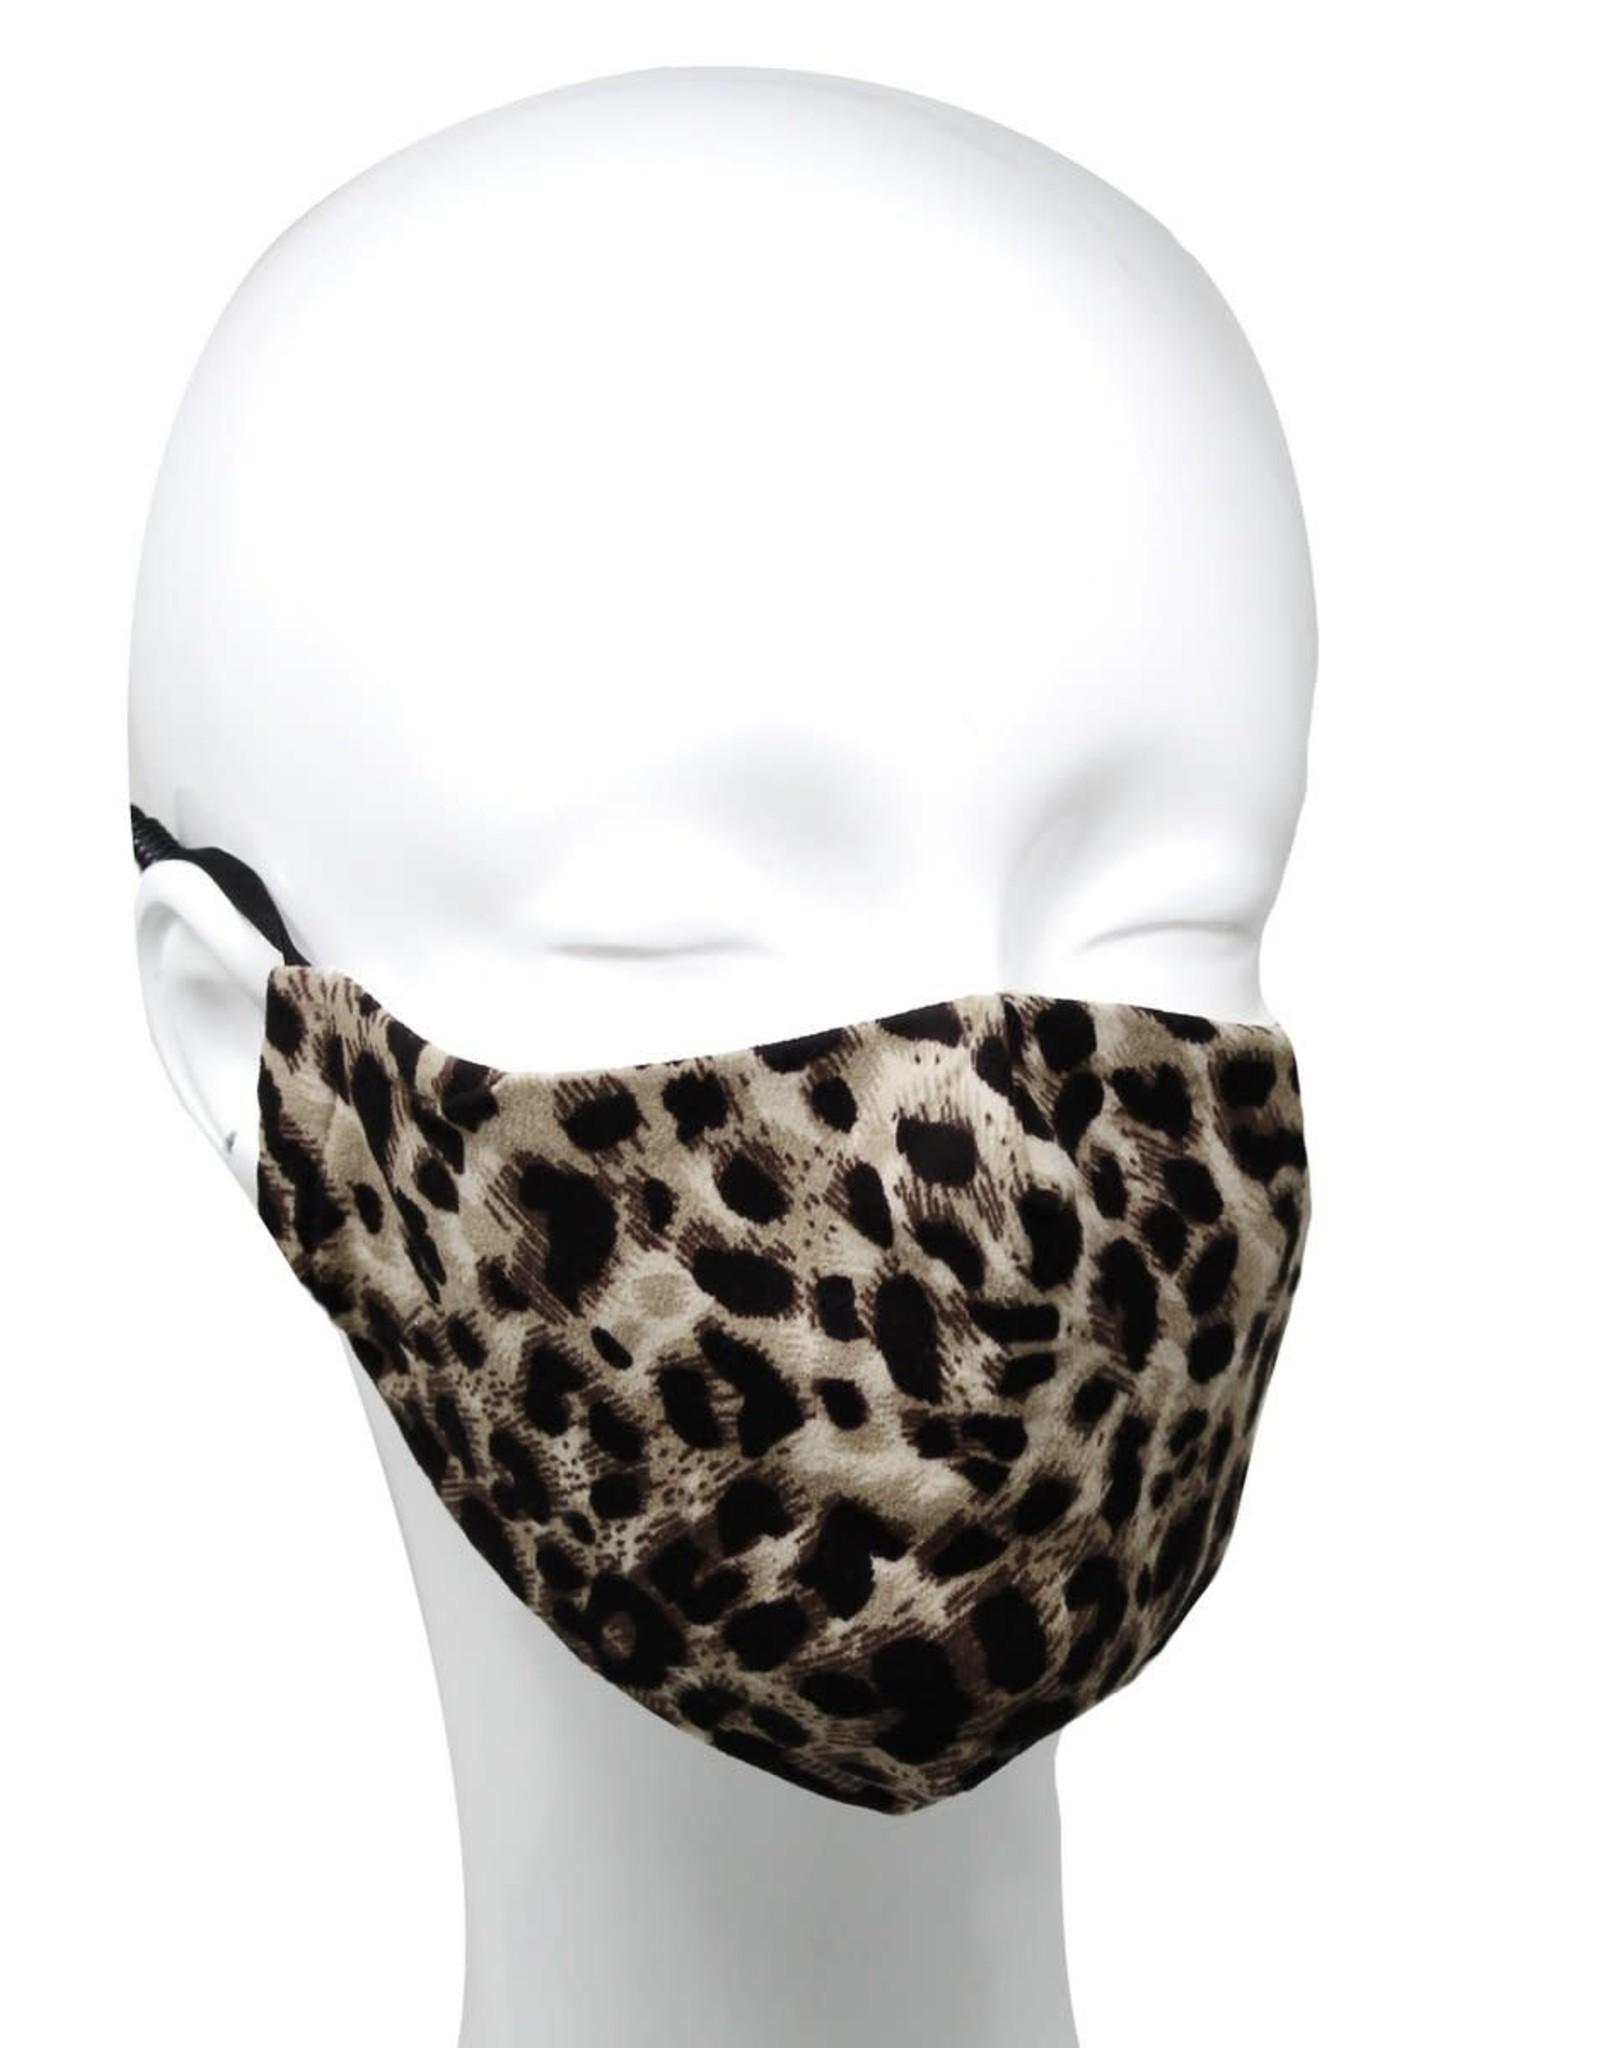 Face Mask Leopard Print w/Replaceable Filter Pocket